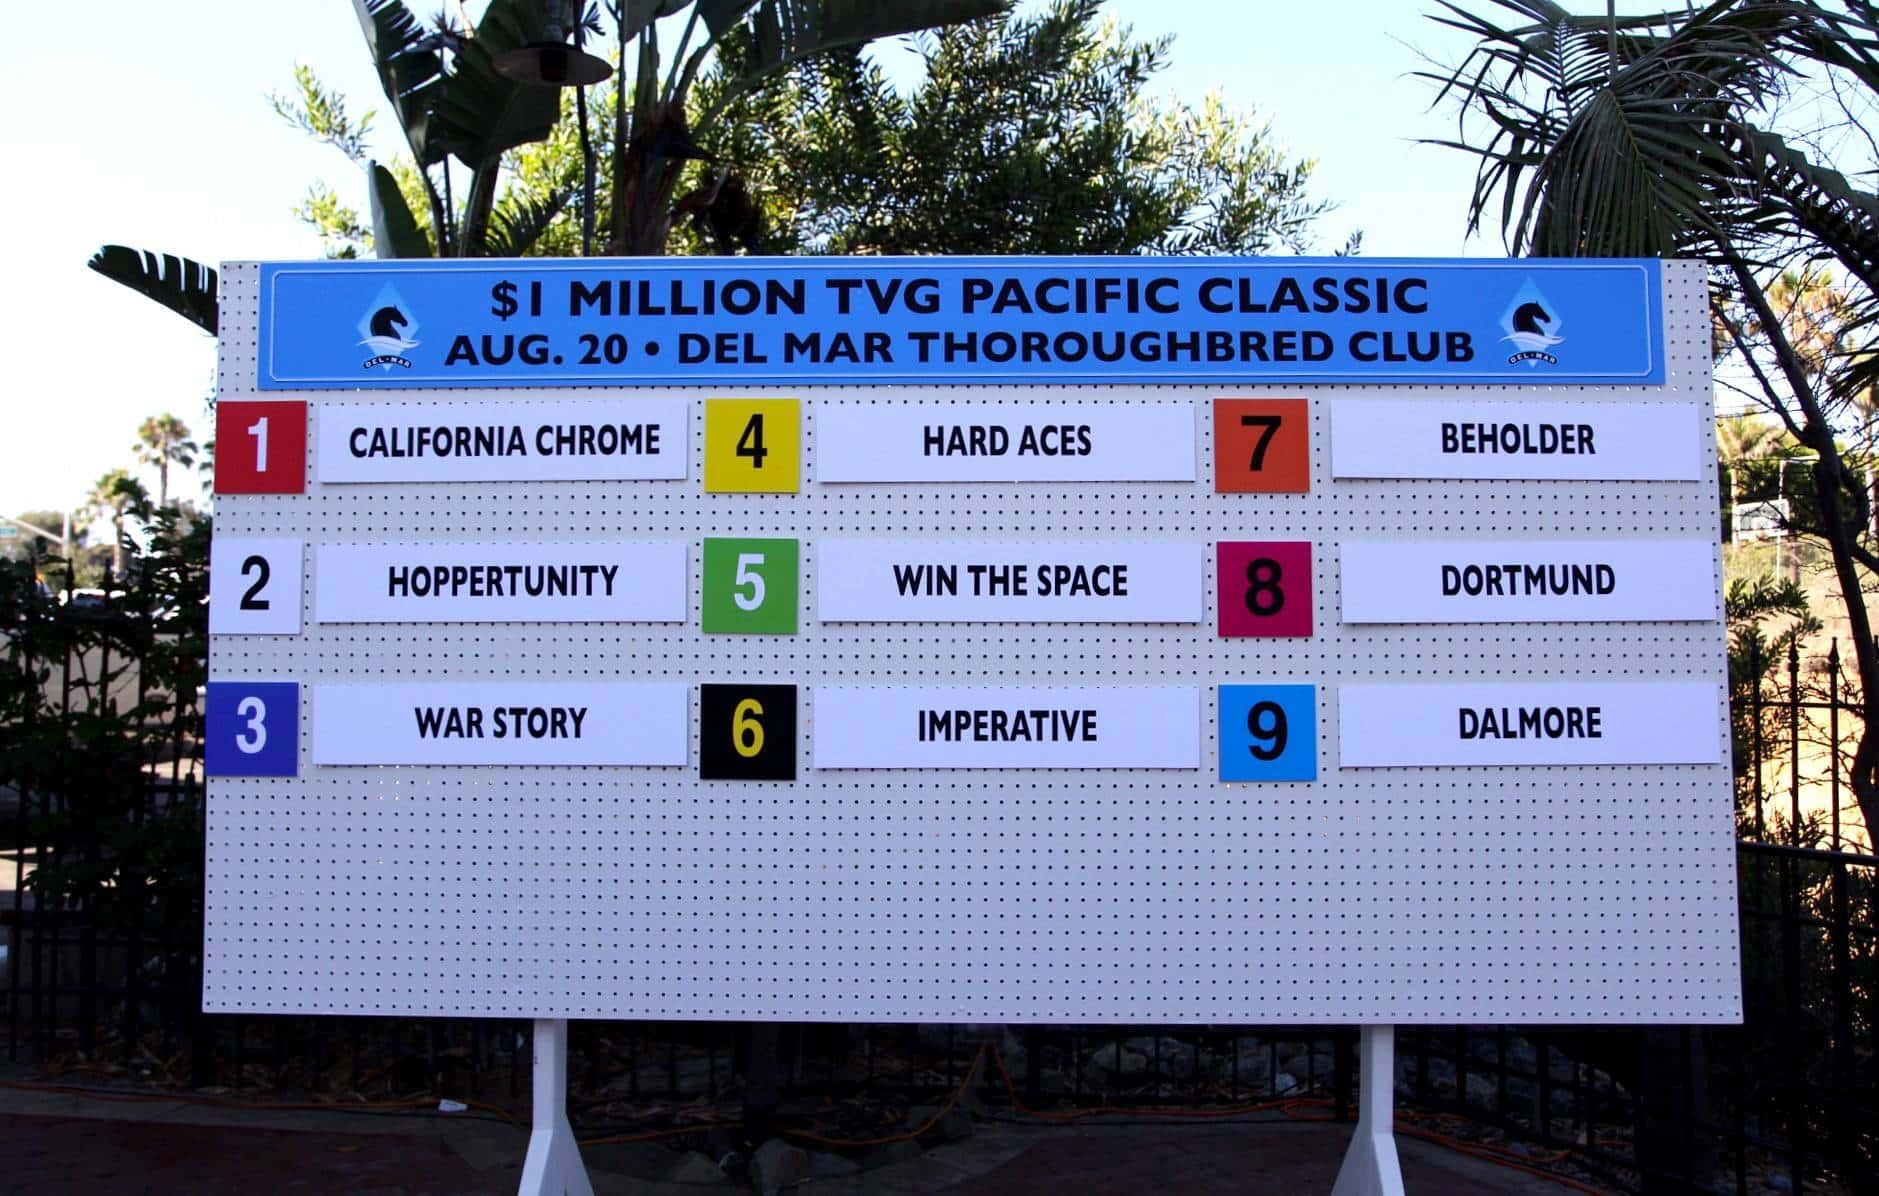 2016 TVG Pacific Classic Draw - Del Mar Thoroughbred Club